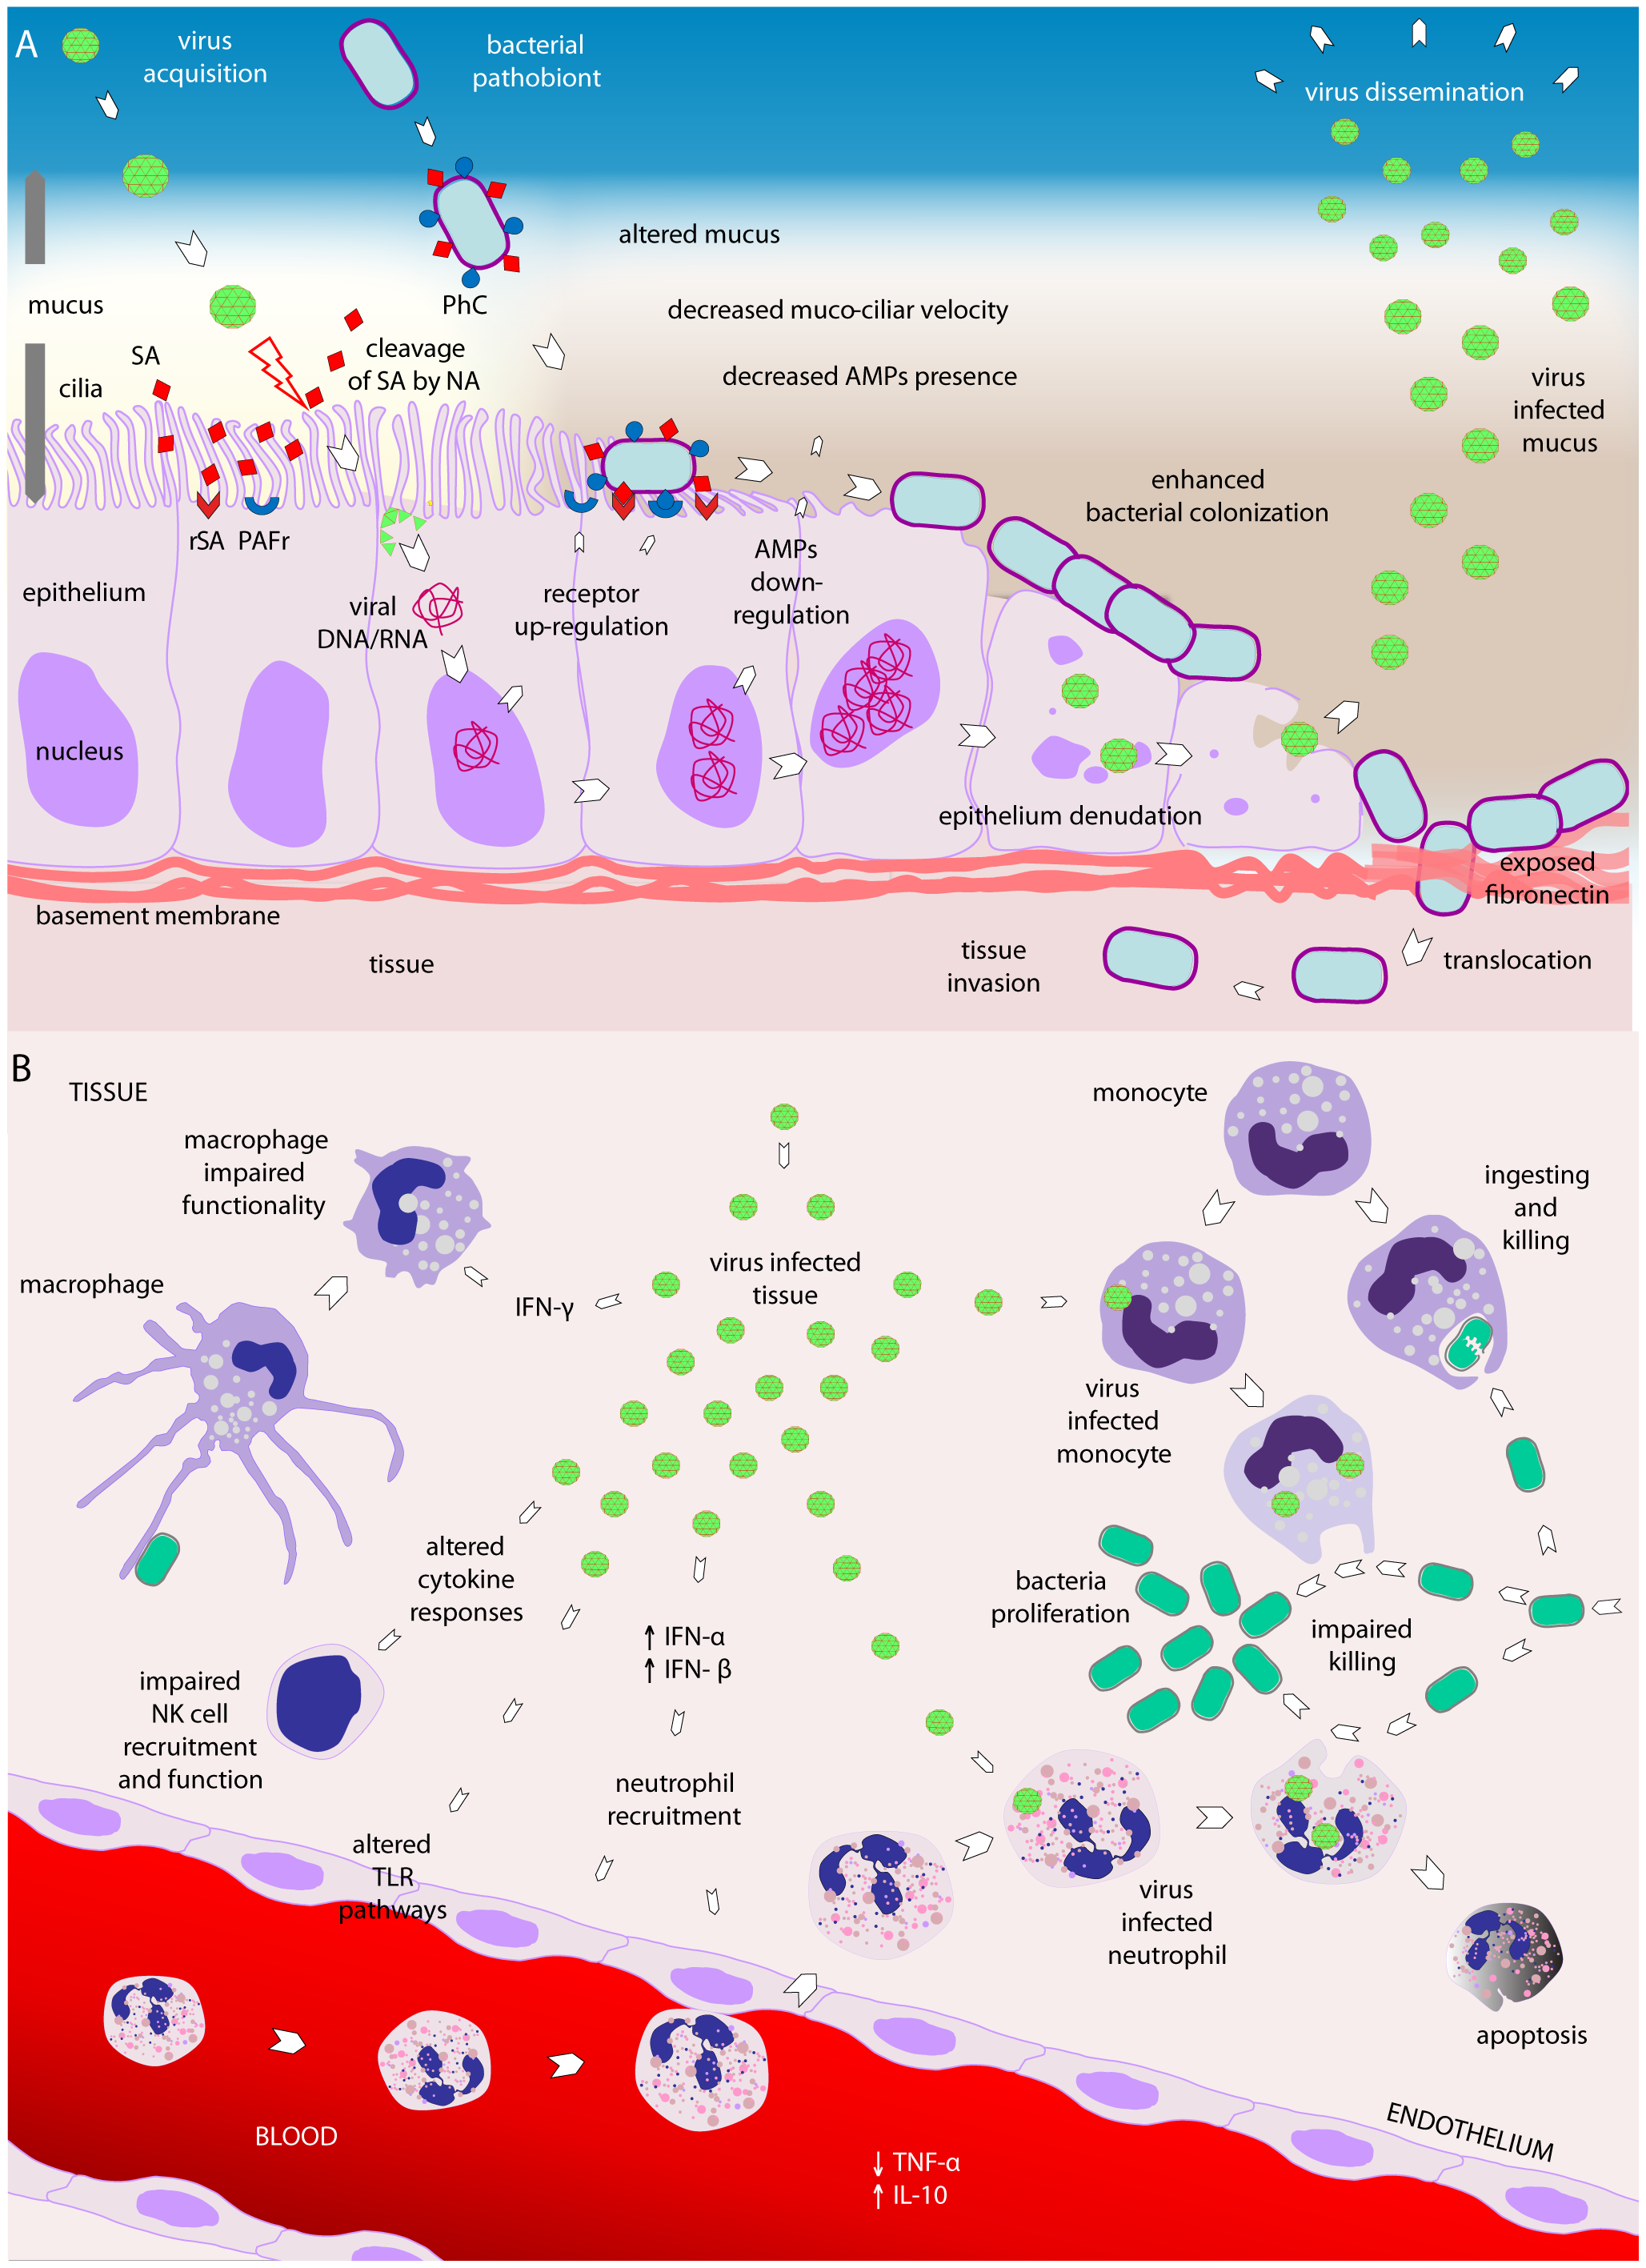 Viral–bacterial interactions.